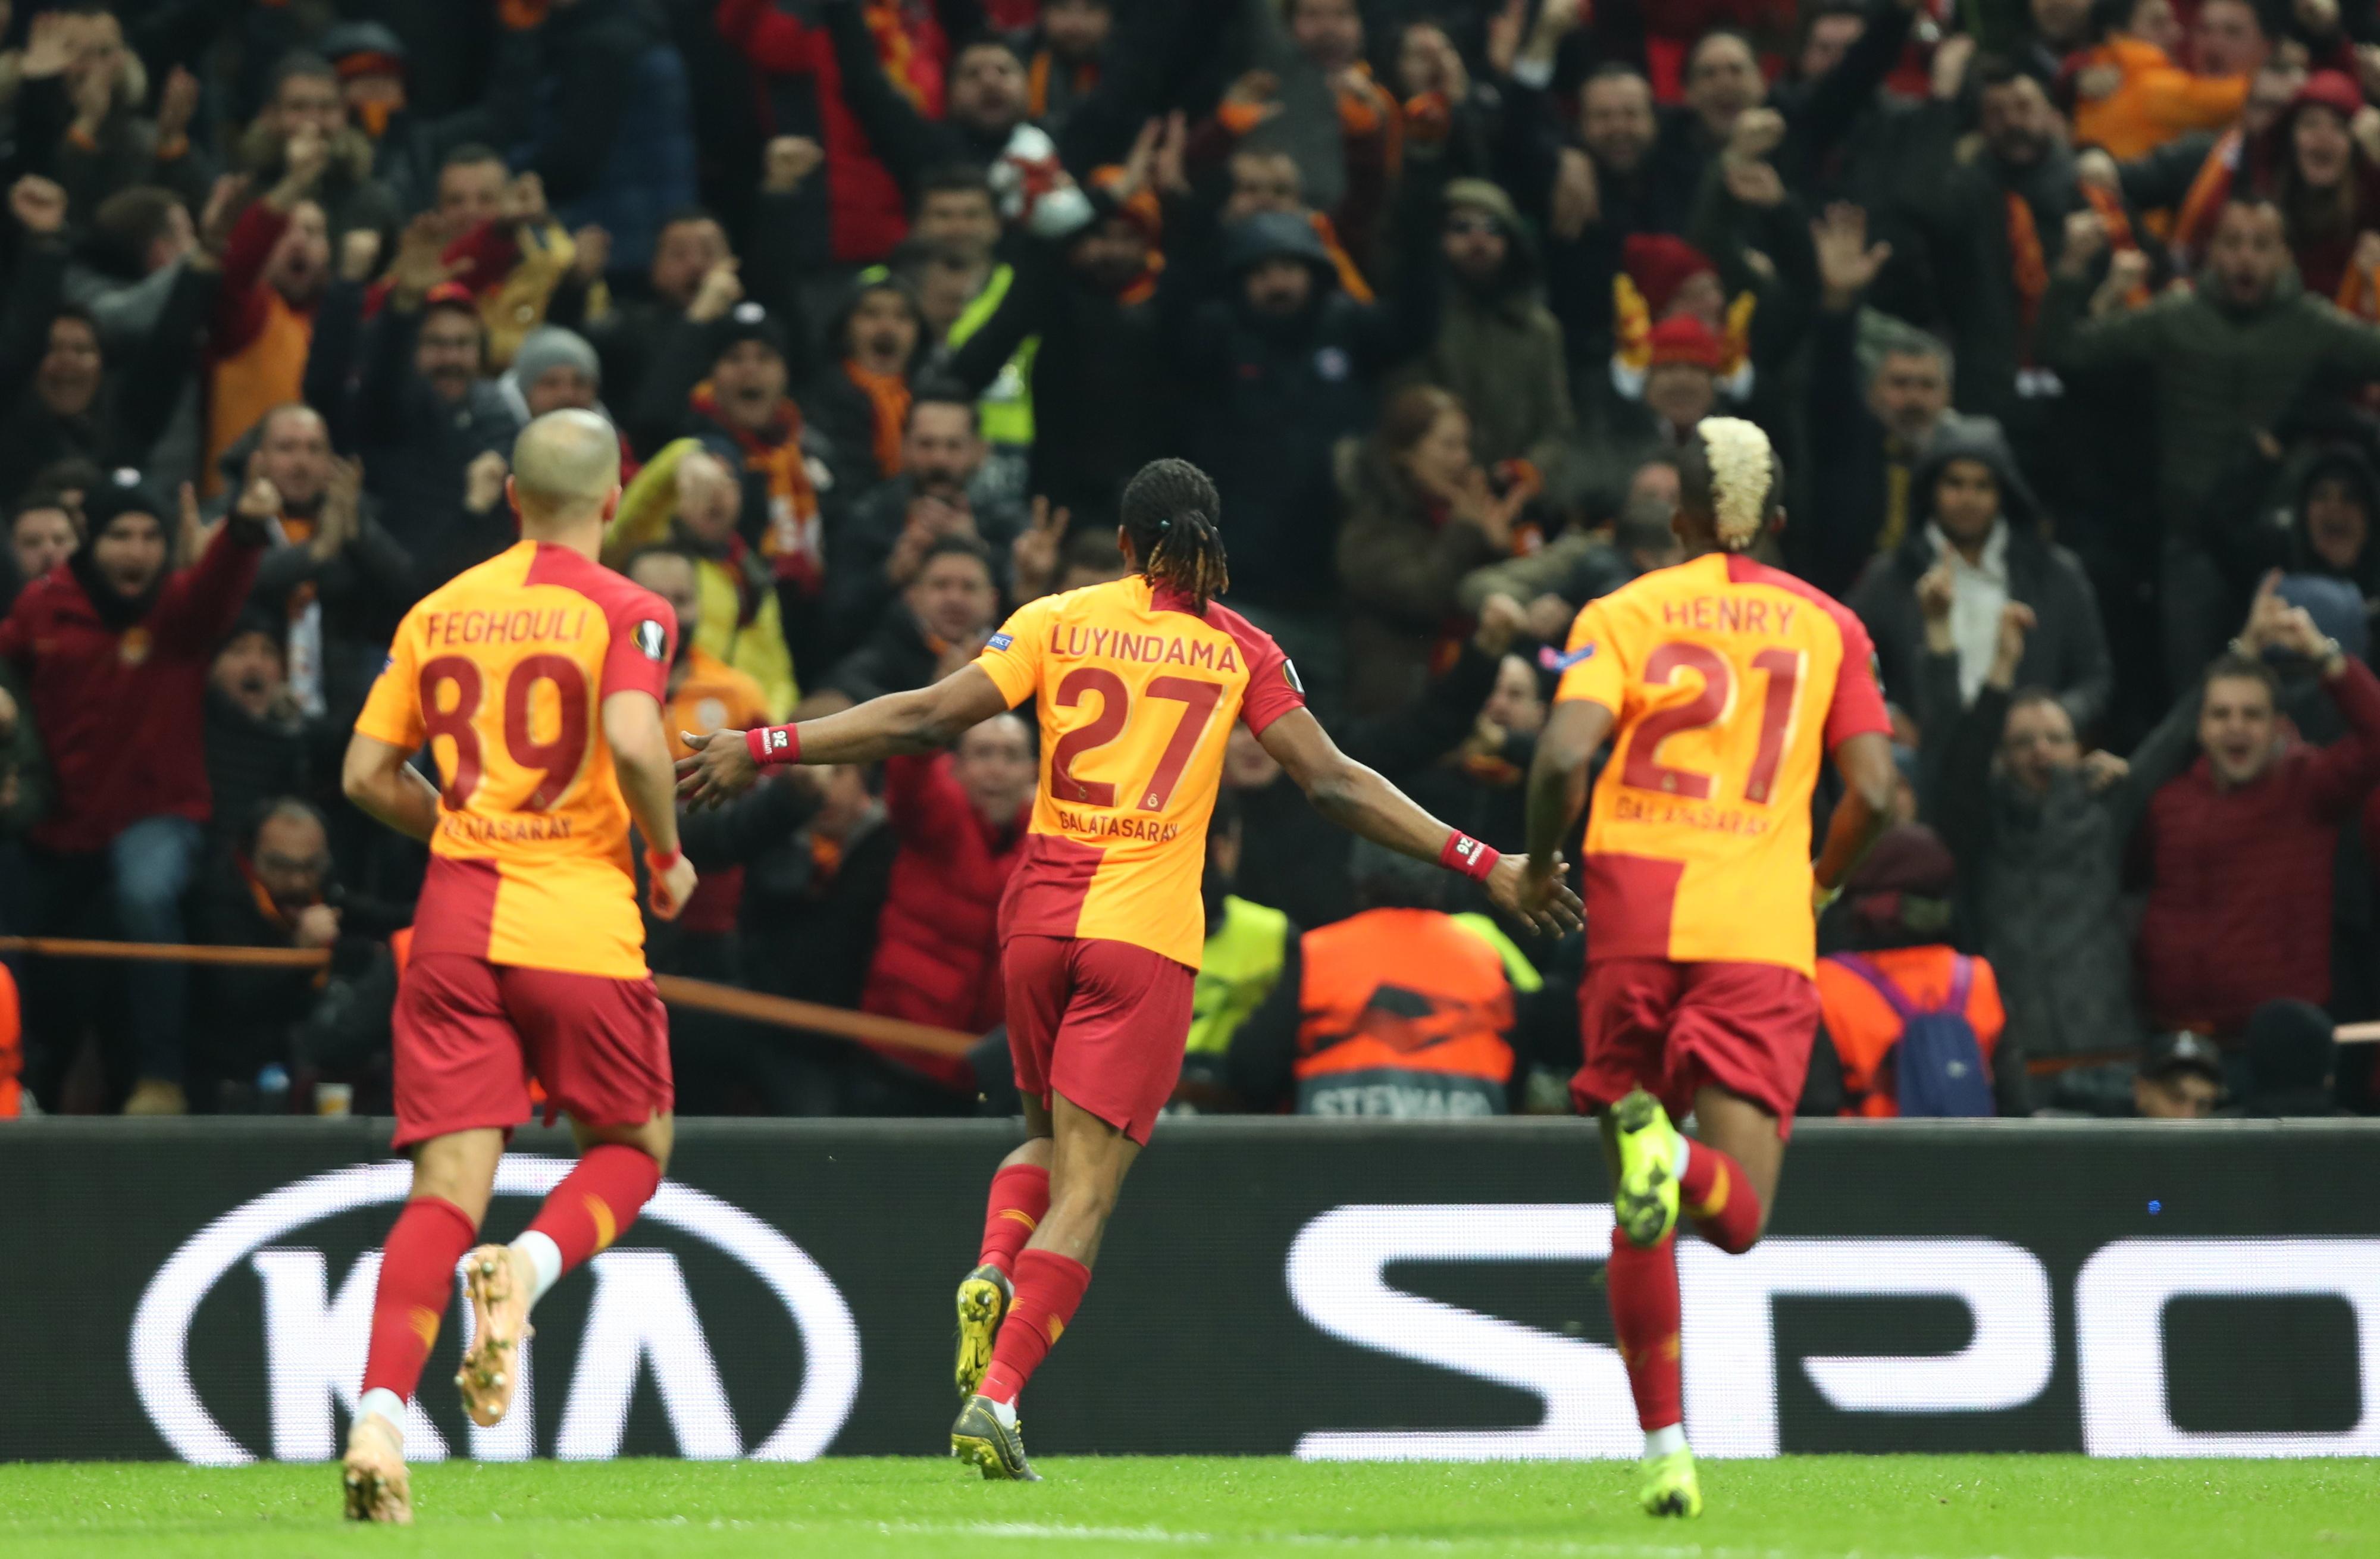 Galatasaray goleia na Turquia antes de visitar o Benfica para a Liga Europa